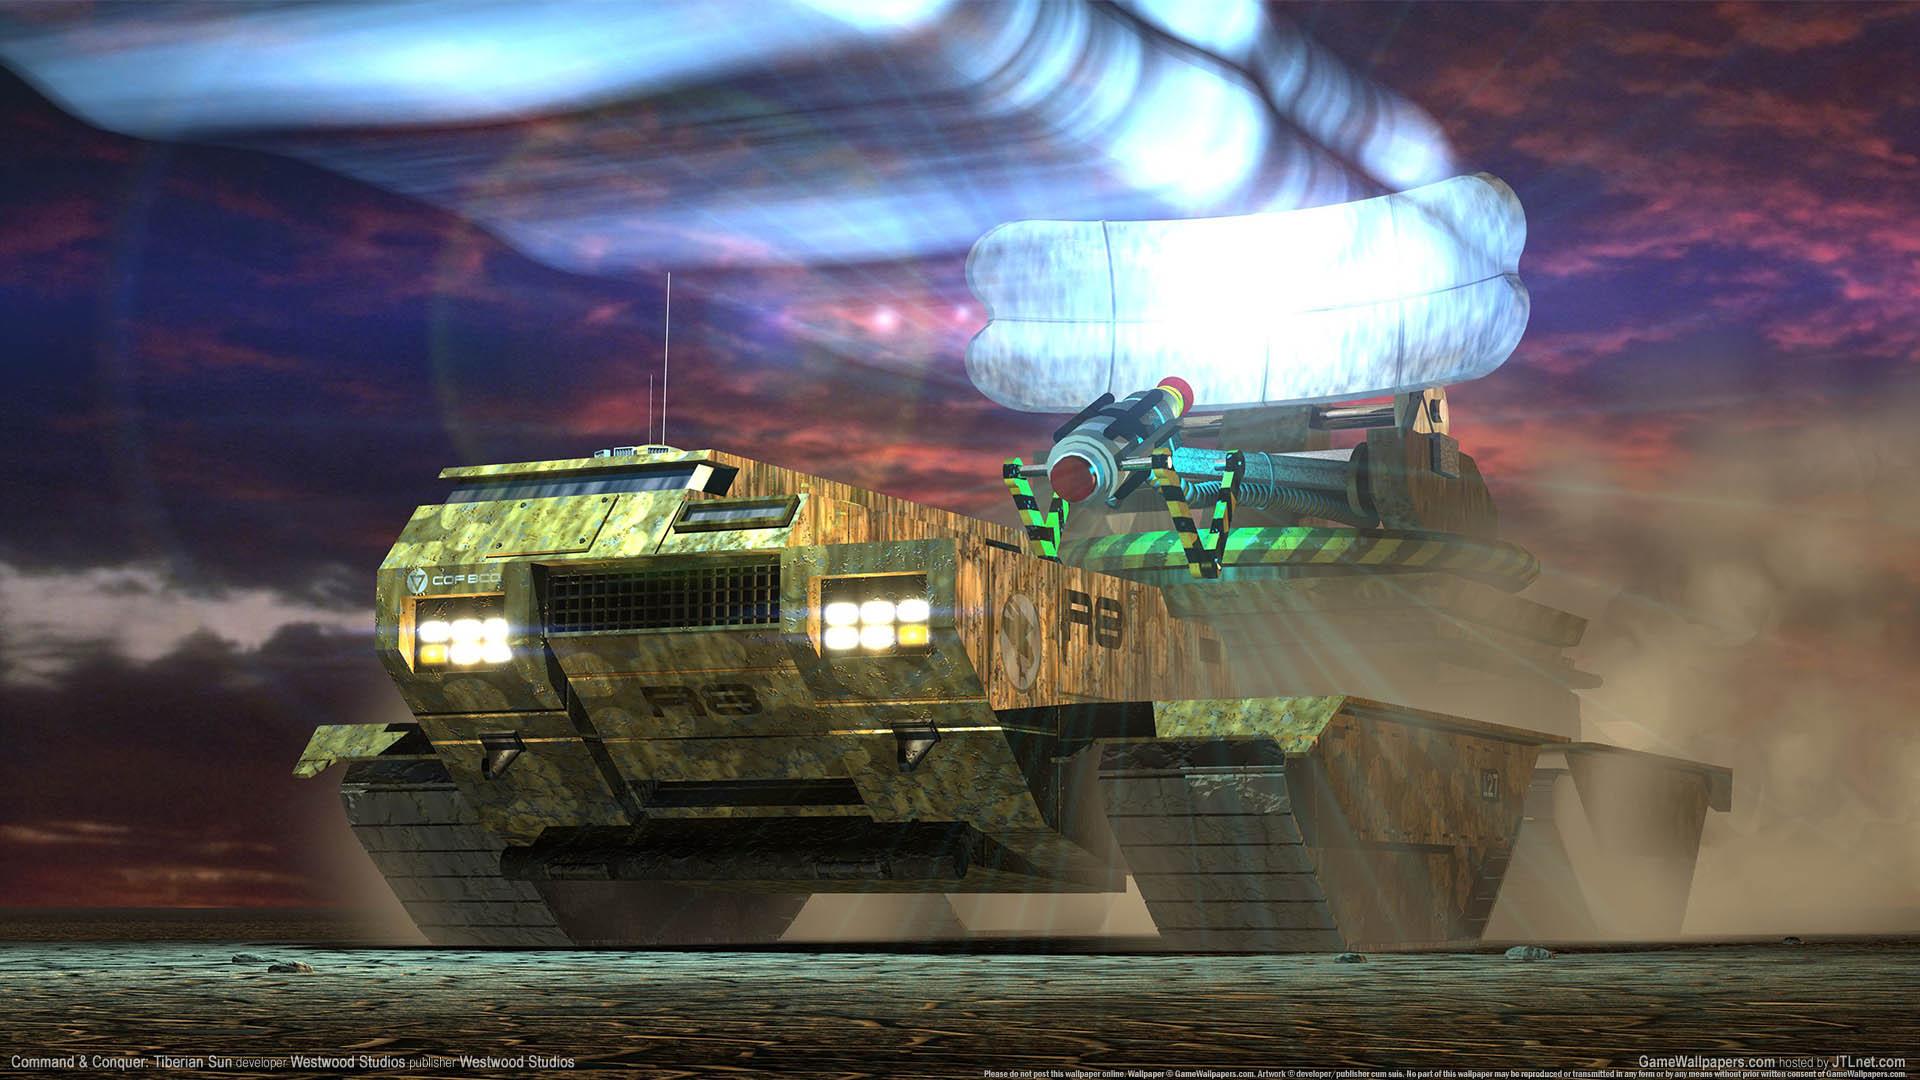 Command & Conquer: Tiberian Sun Hintergrundbild 01 1920x1080